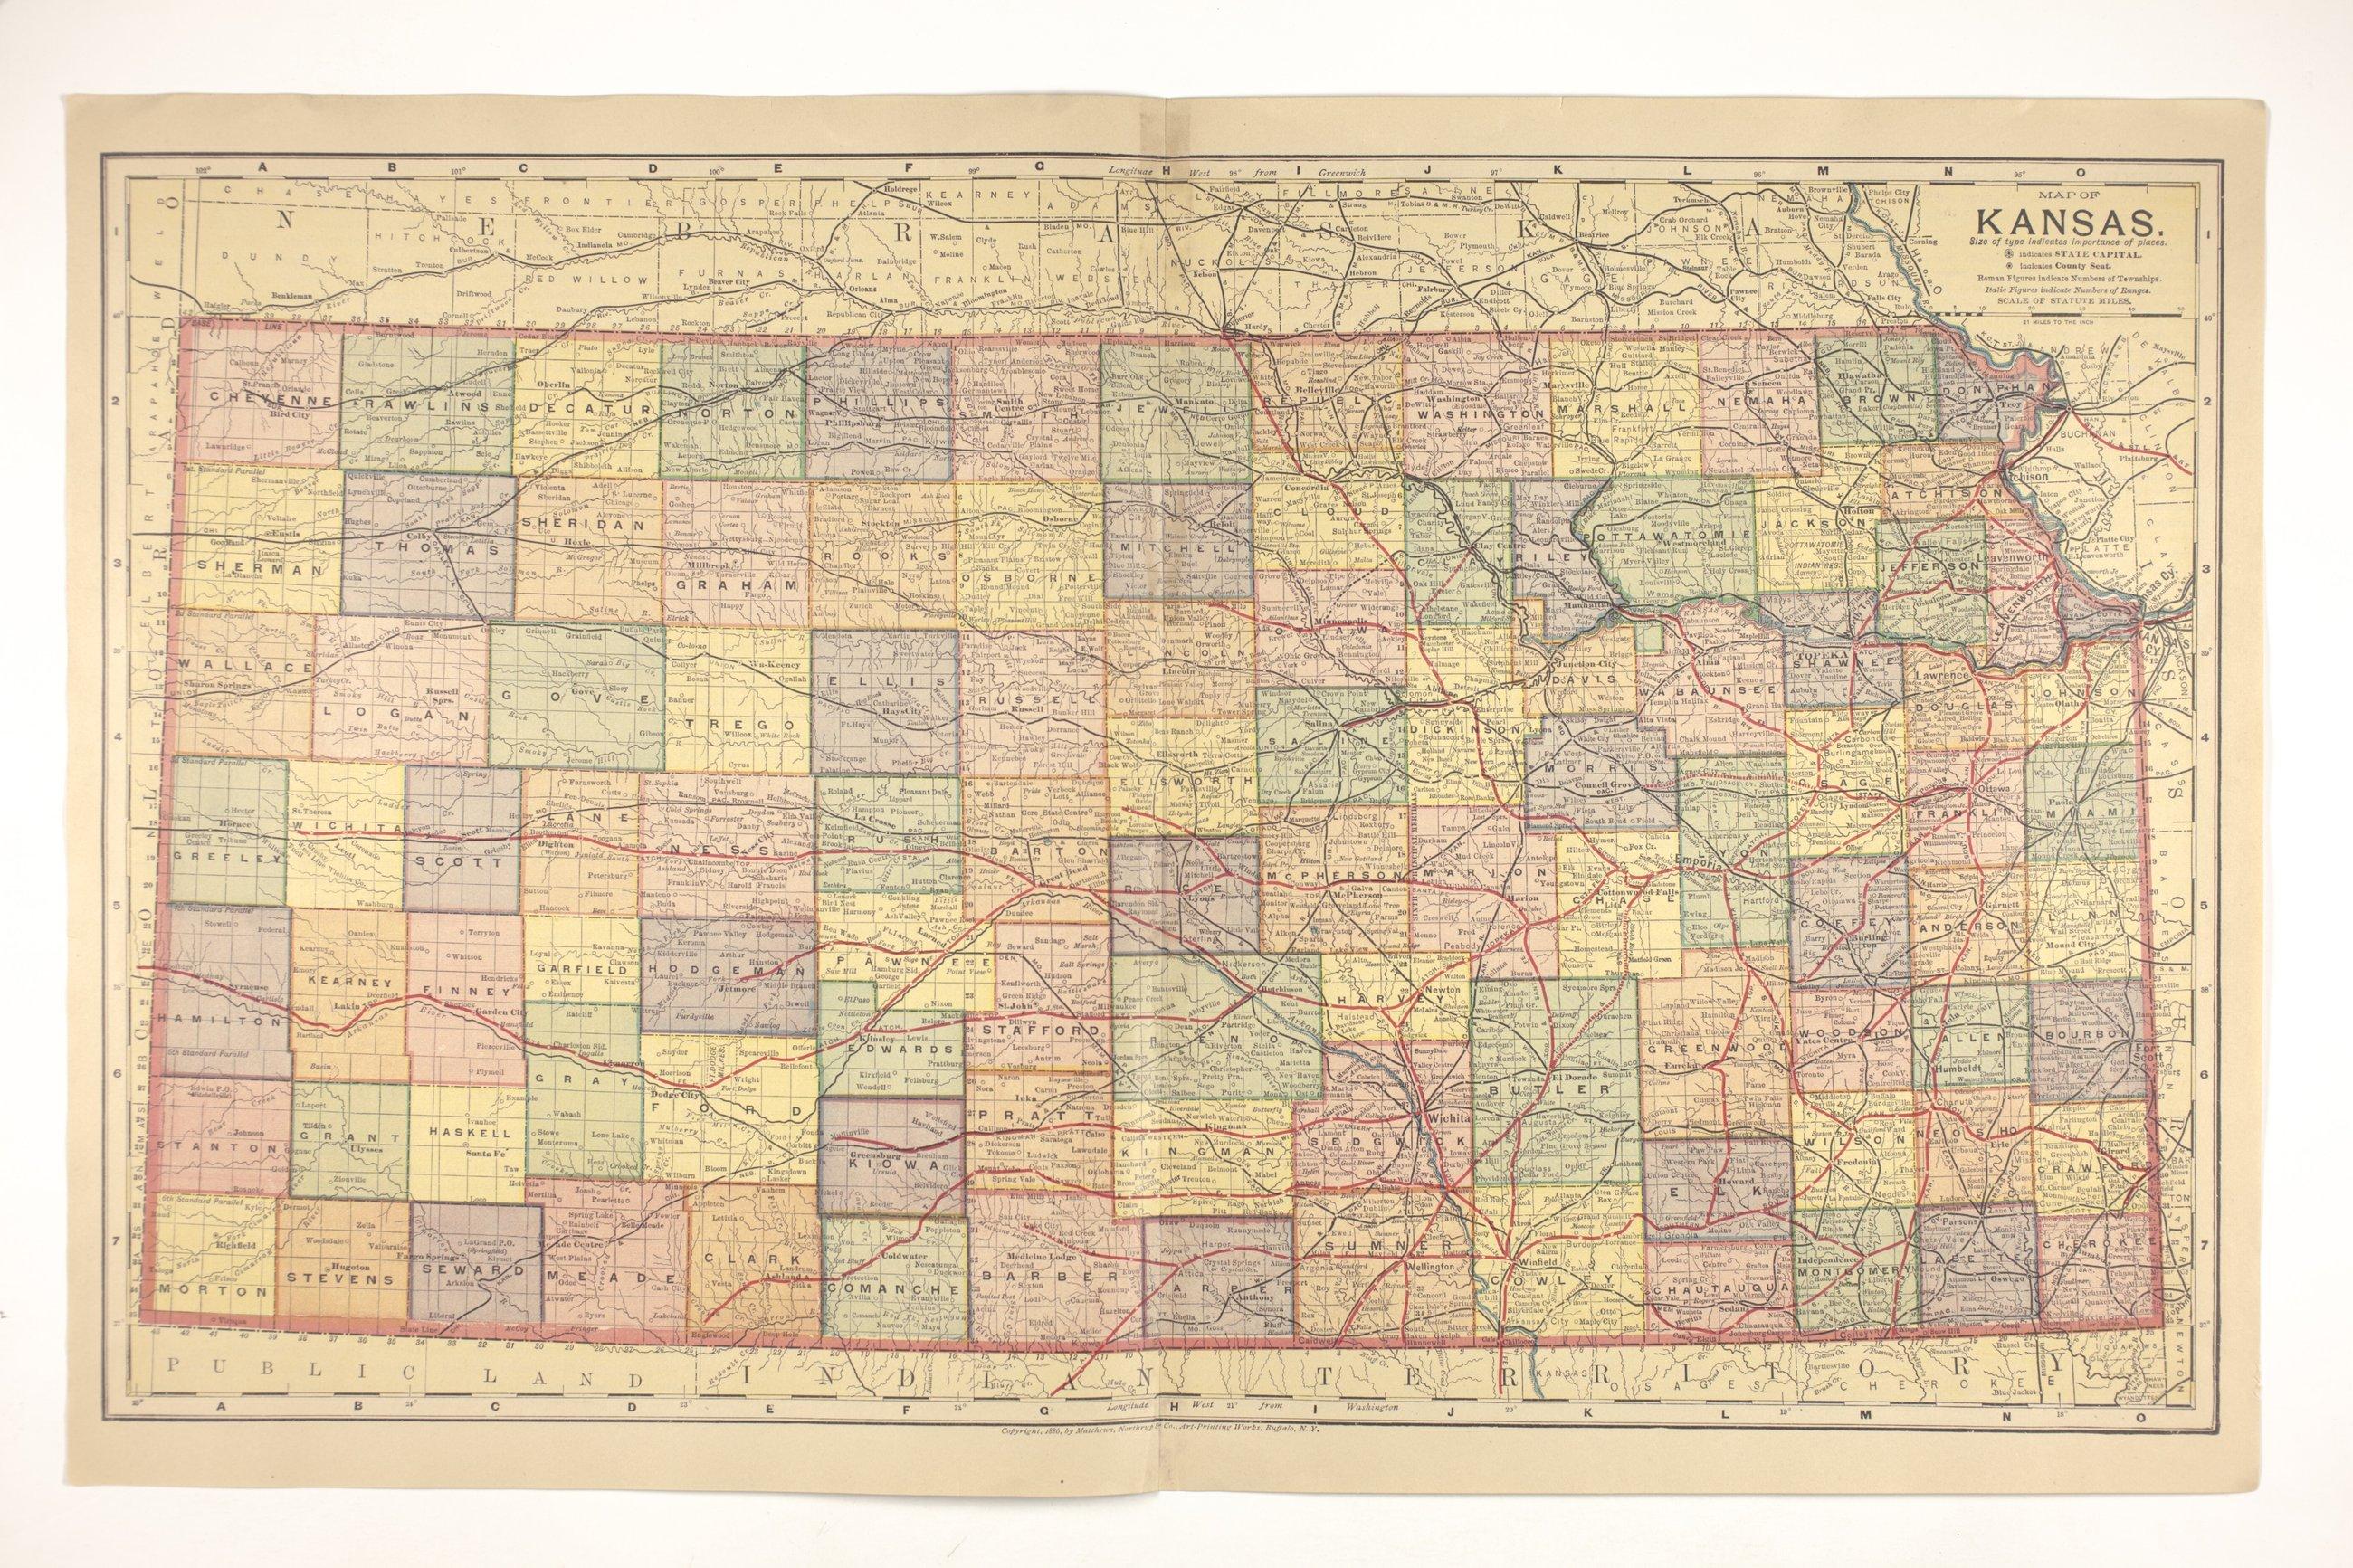 Atlas of the Santa Fe Route - Map of Kansas